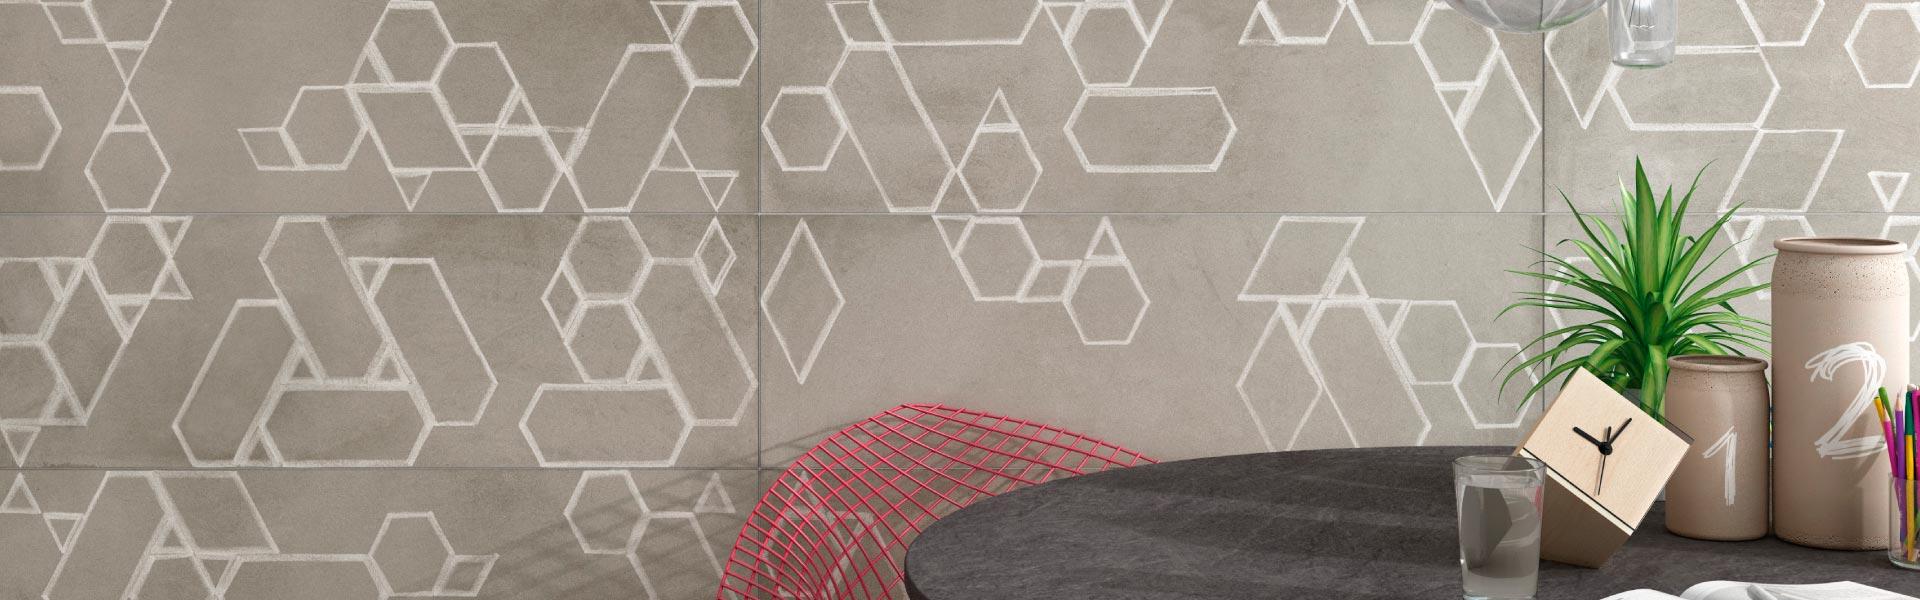 Vives wall tiles white body kent 20x50 kent white body wall tiles by vives azulejos y gres sa dailygadgetfo Choice Image